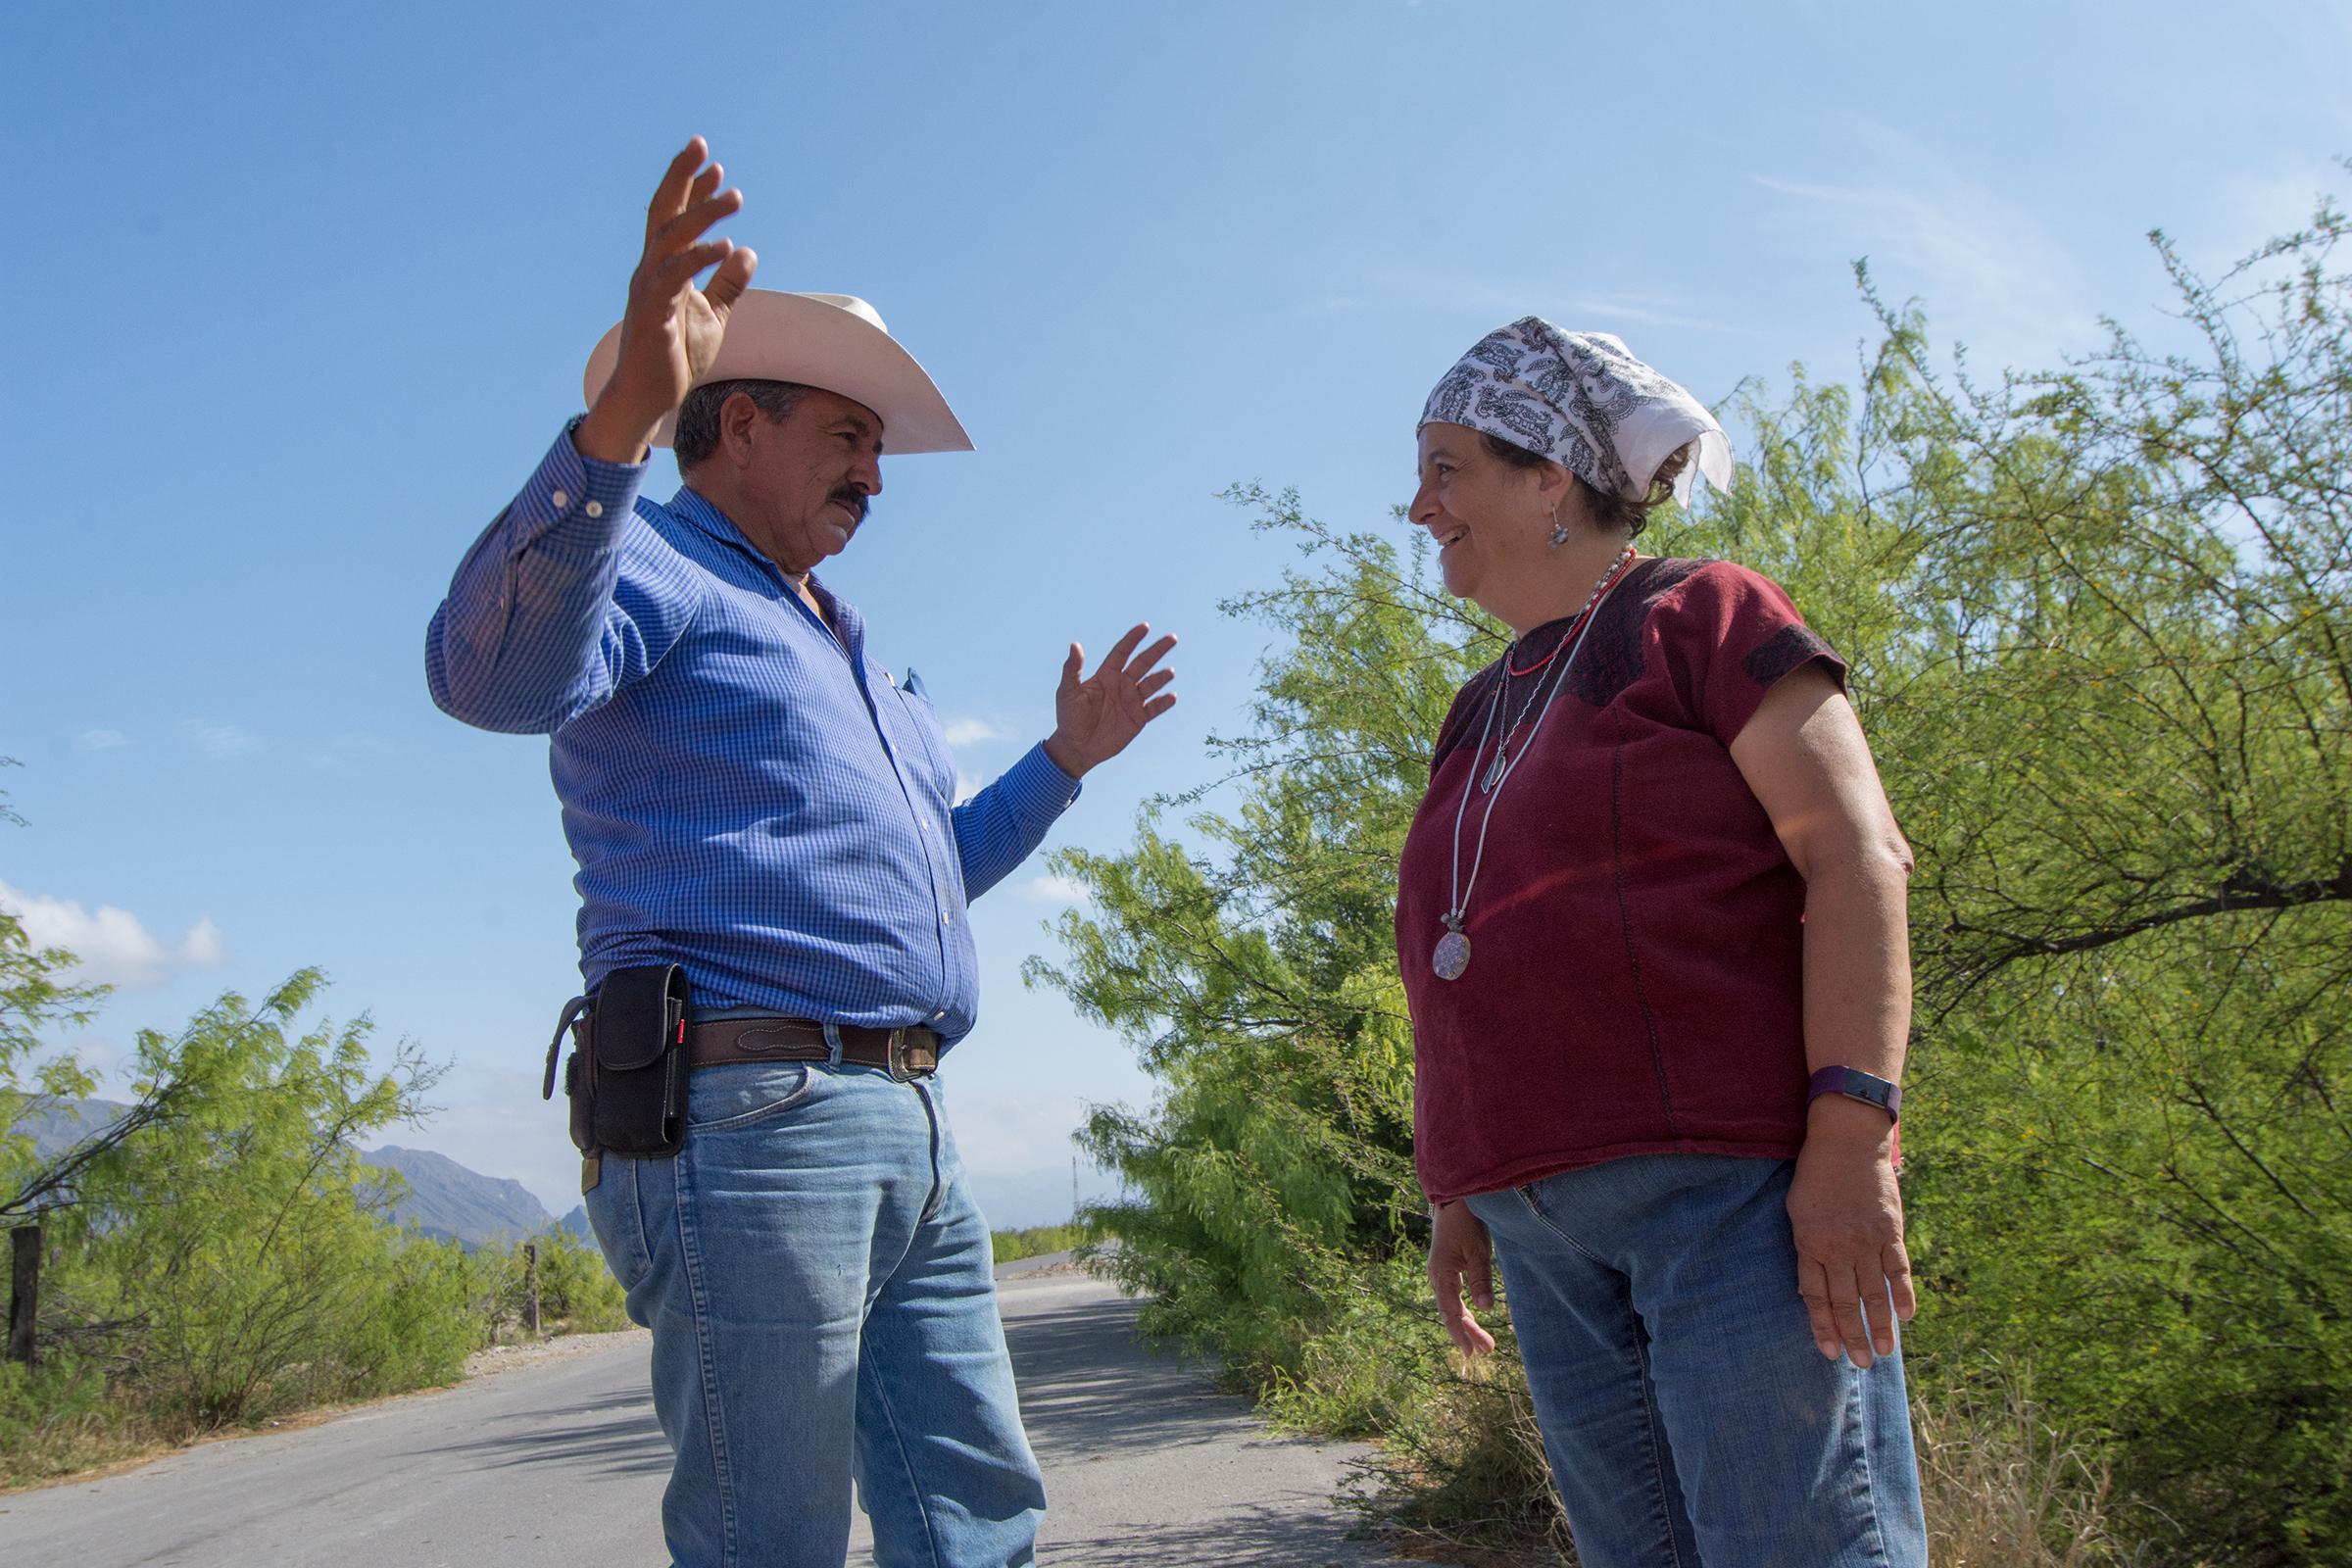 Local landowner Arturo Lerma and Valeria Souza discuss the importance of preserving the wetlands in the basin.